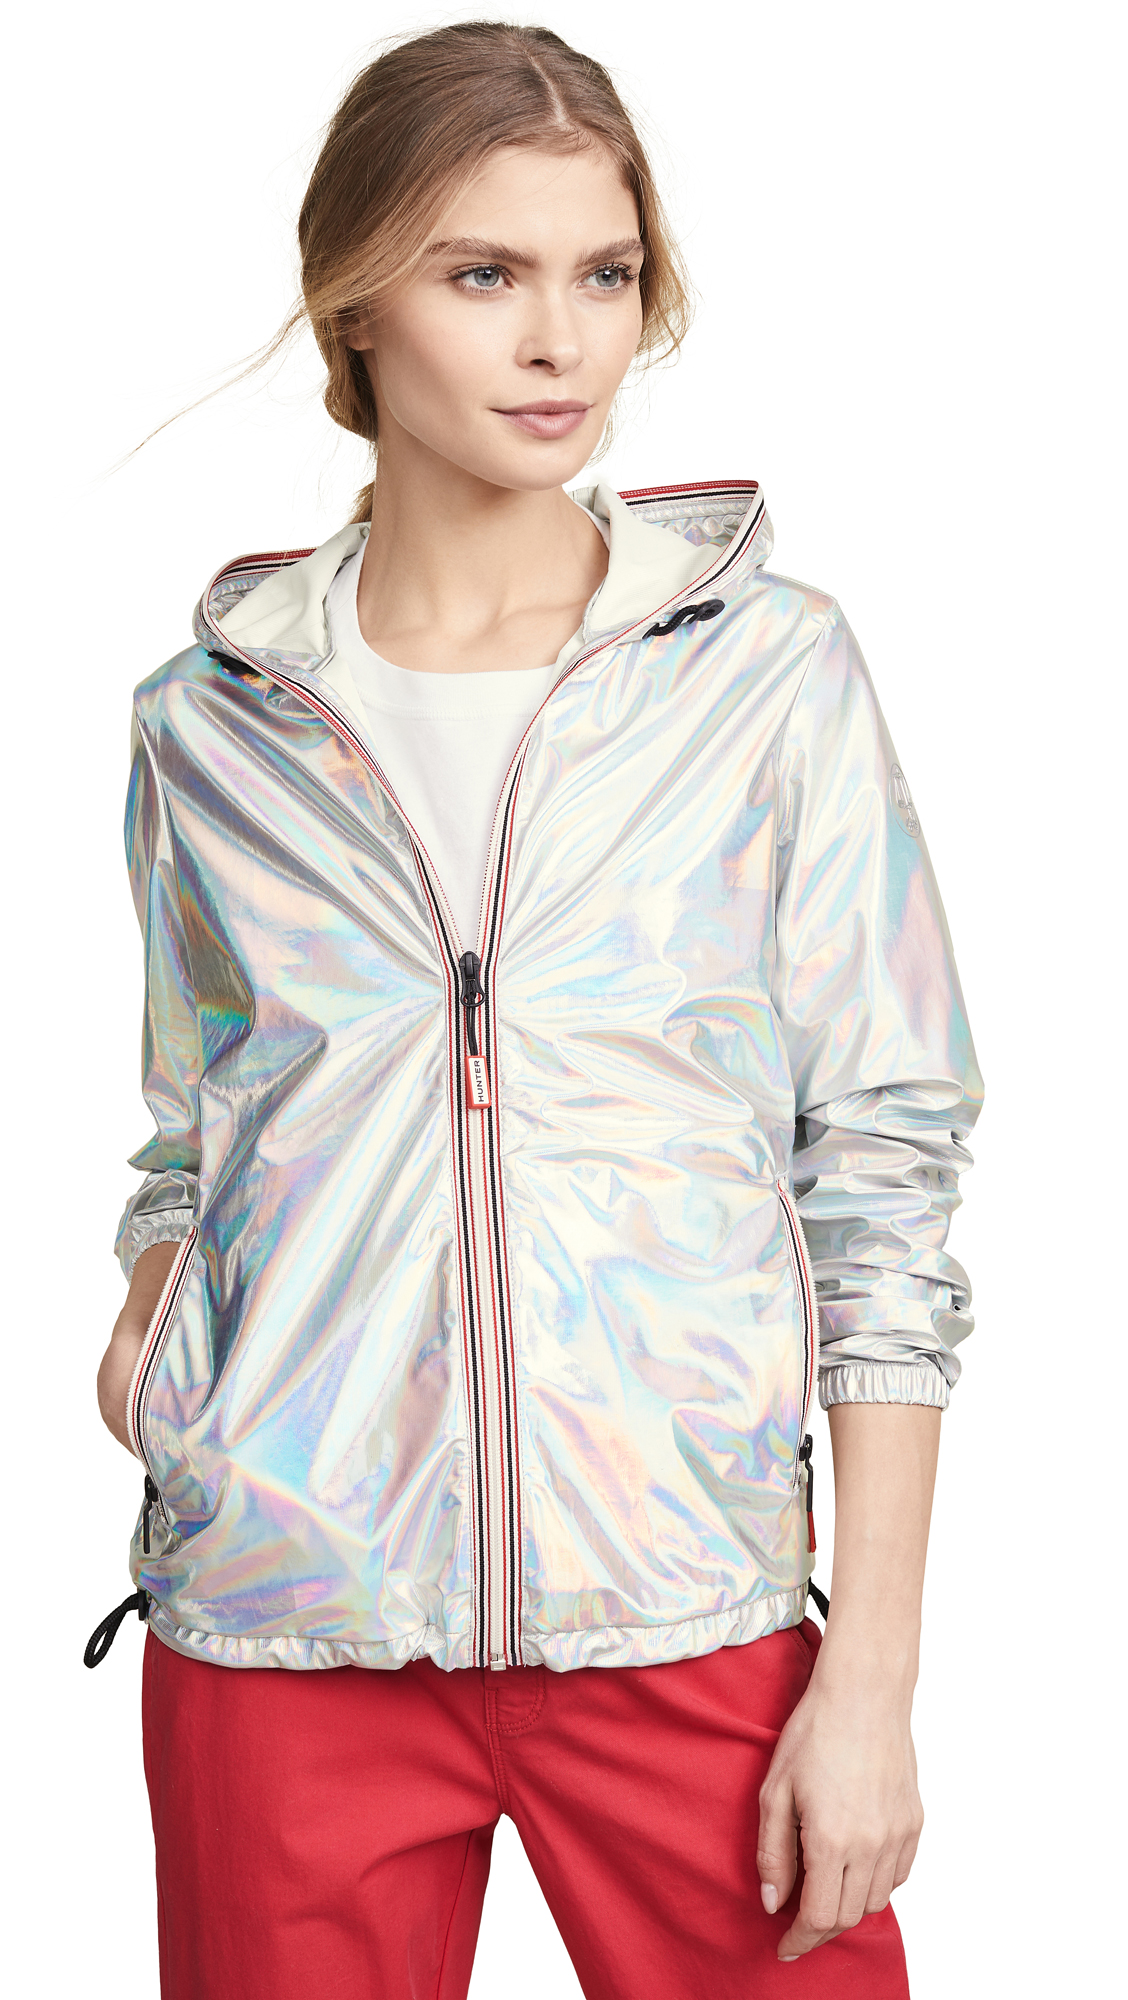 Buy Hunter Boots Shell Jacket online beautiful Hunter Boots Jackets, Coats, Trench Coats